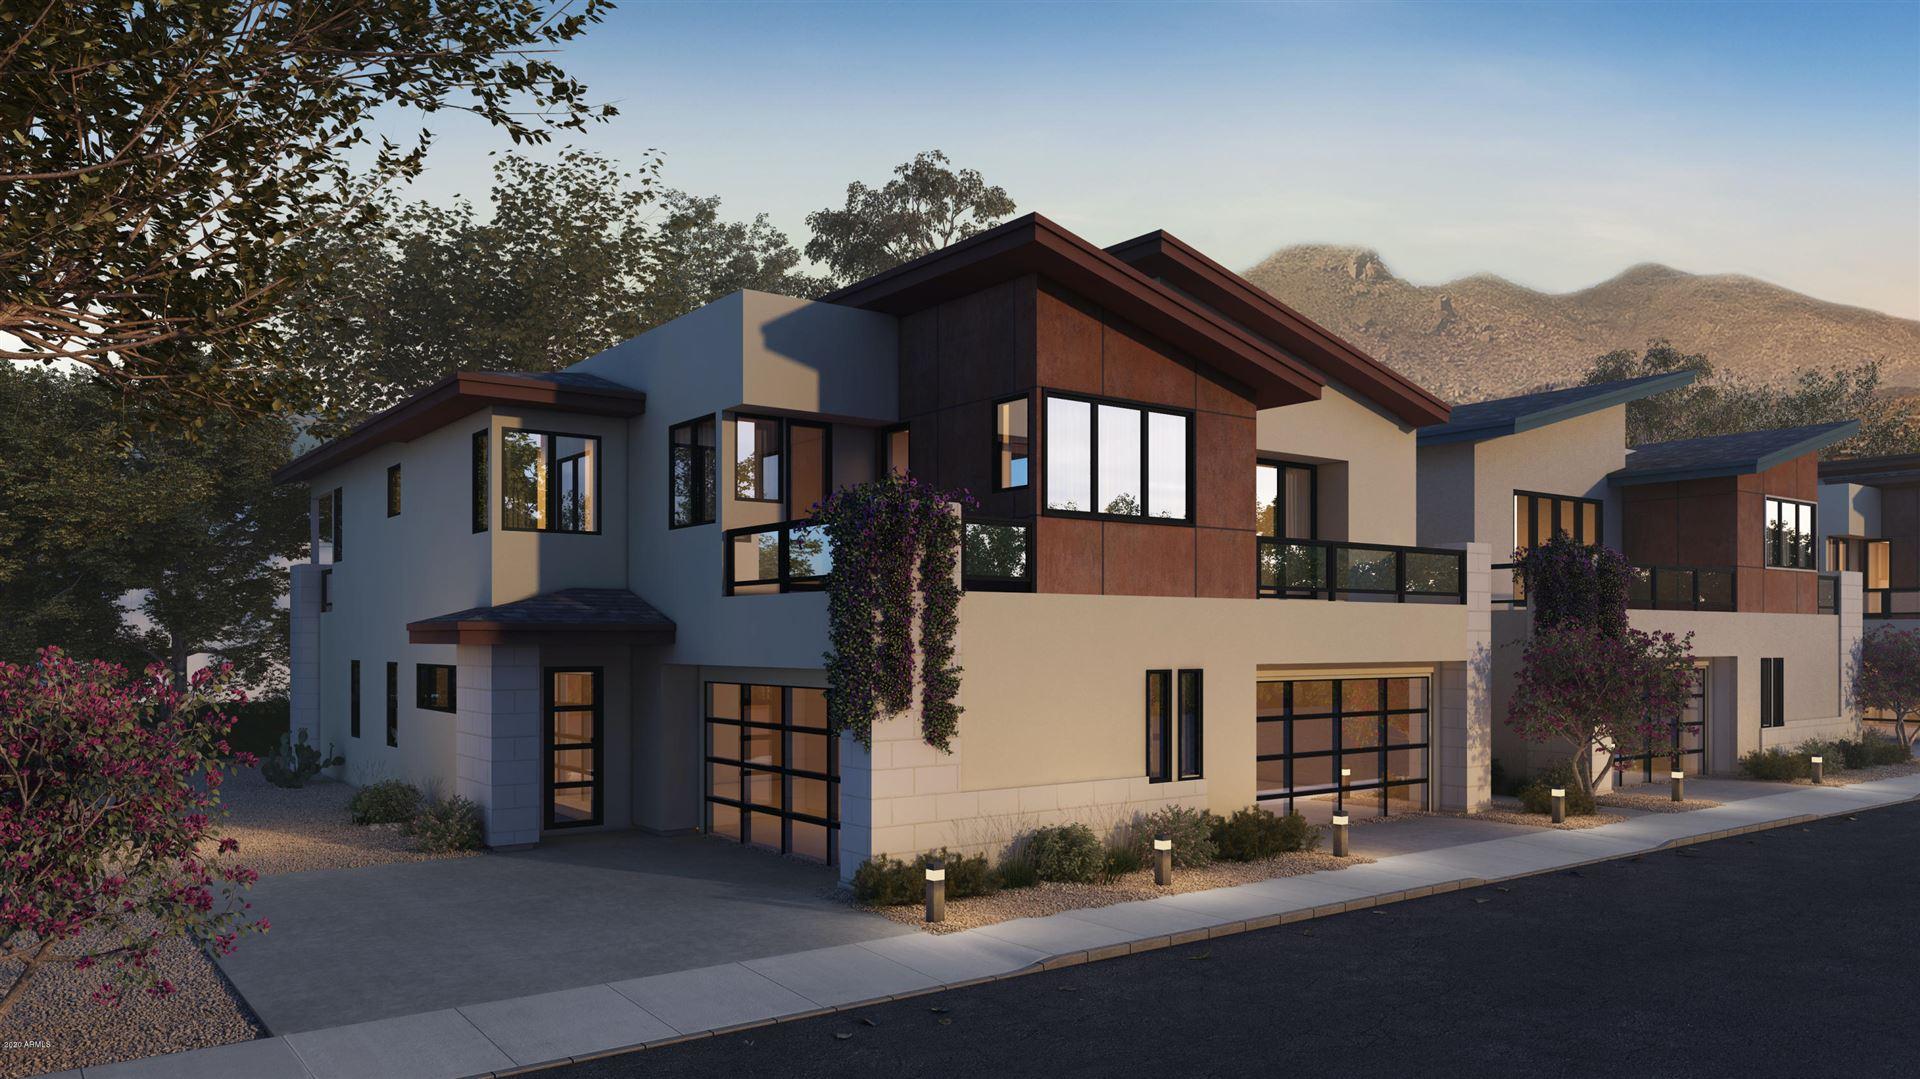 Photo of One E Easy Street #1, Carefree, AZ 85377 (MLS # 6191226)